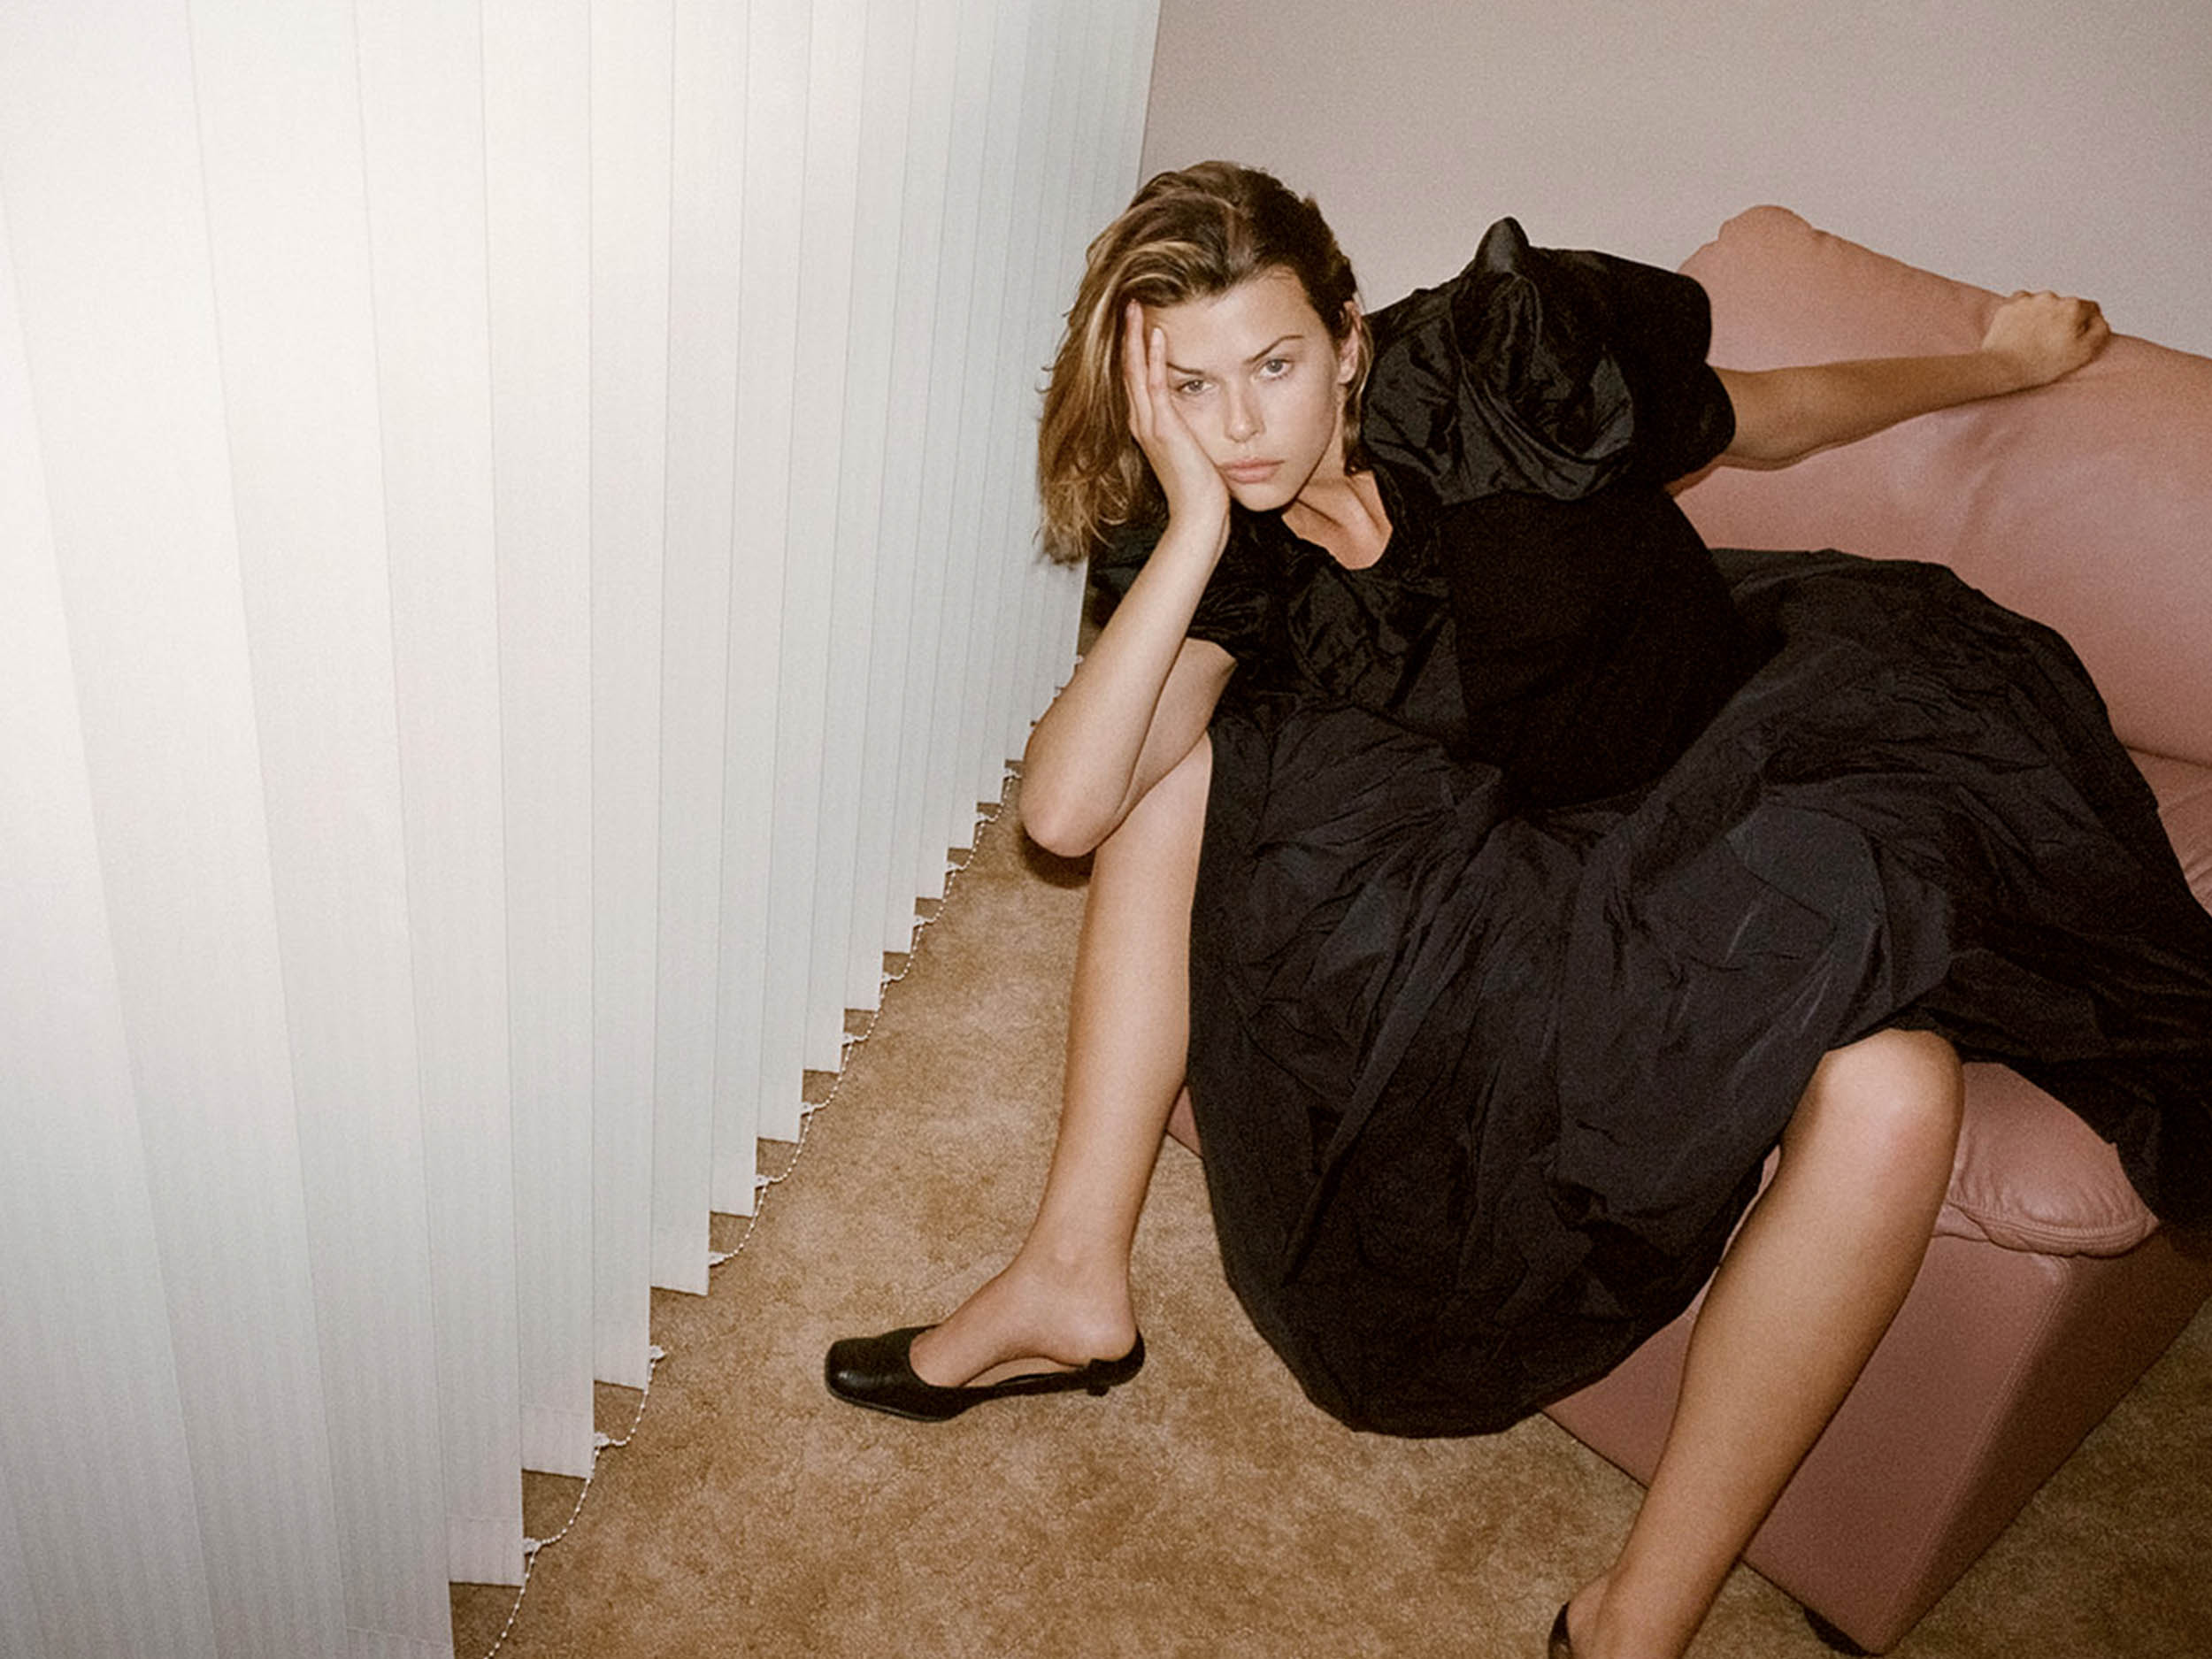 """I'll never do puff if it's safe"": Australian designer Jordan Dalah on his latest collection"